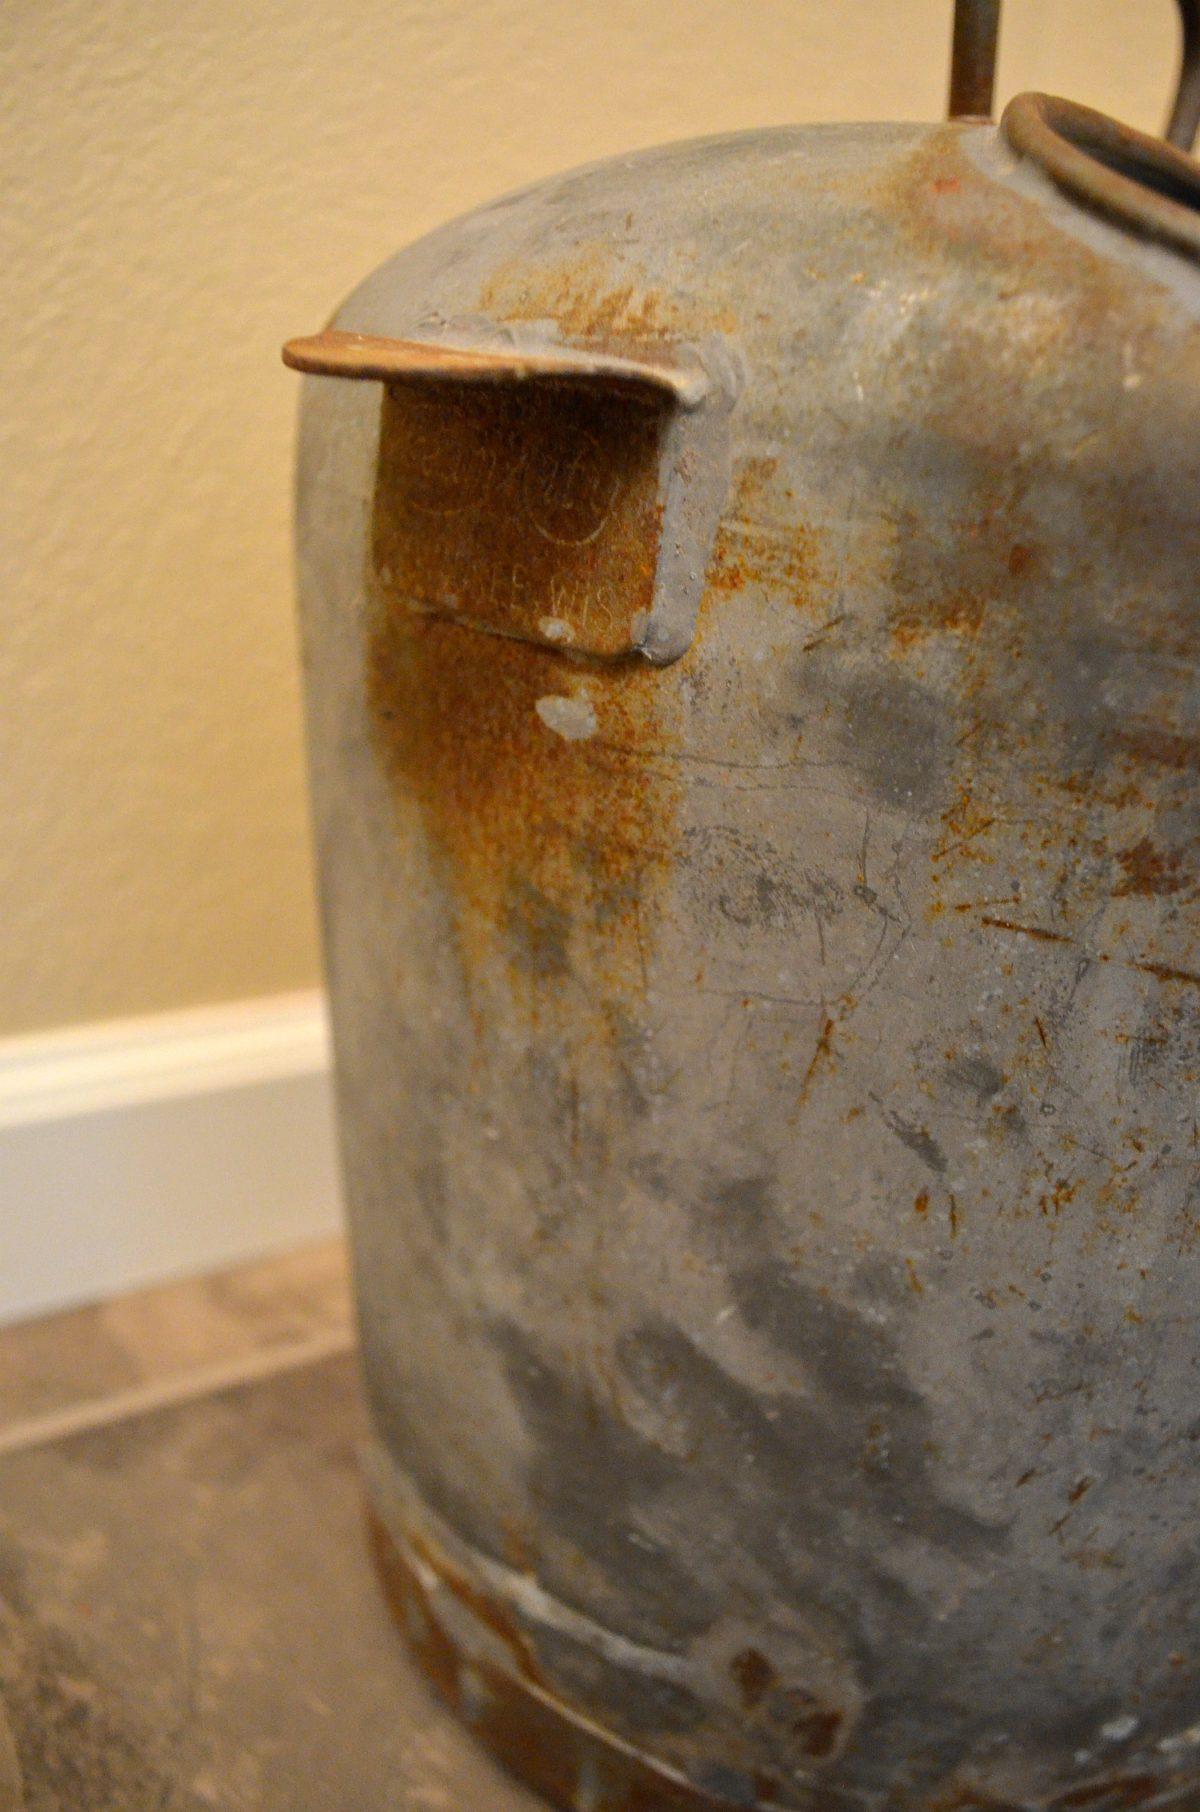 Farmhouse Bathroom::Cream City Can for Toilet Paper